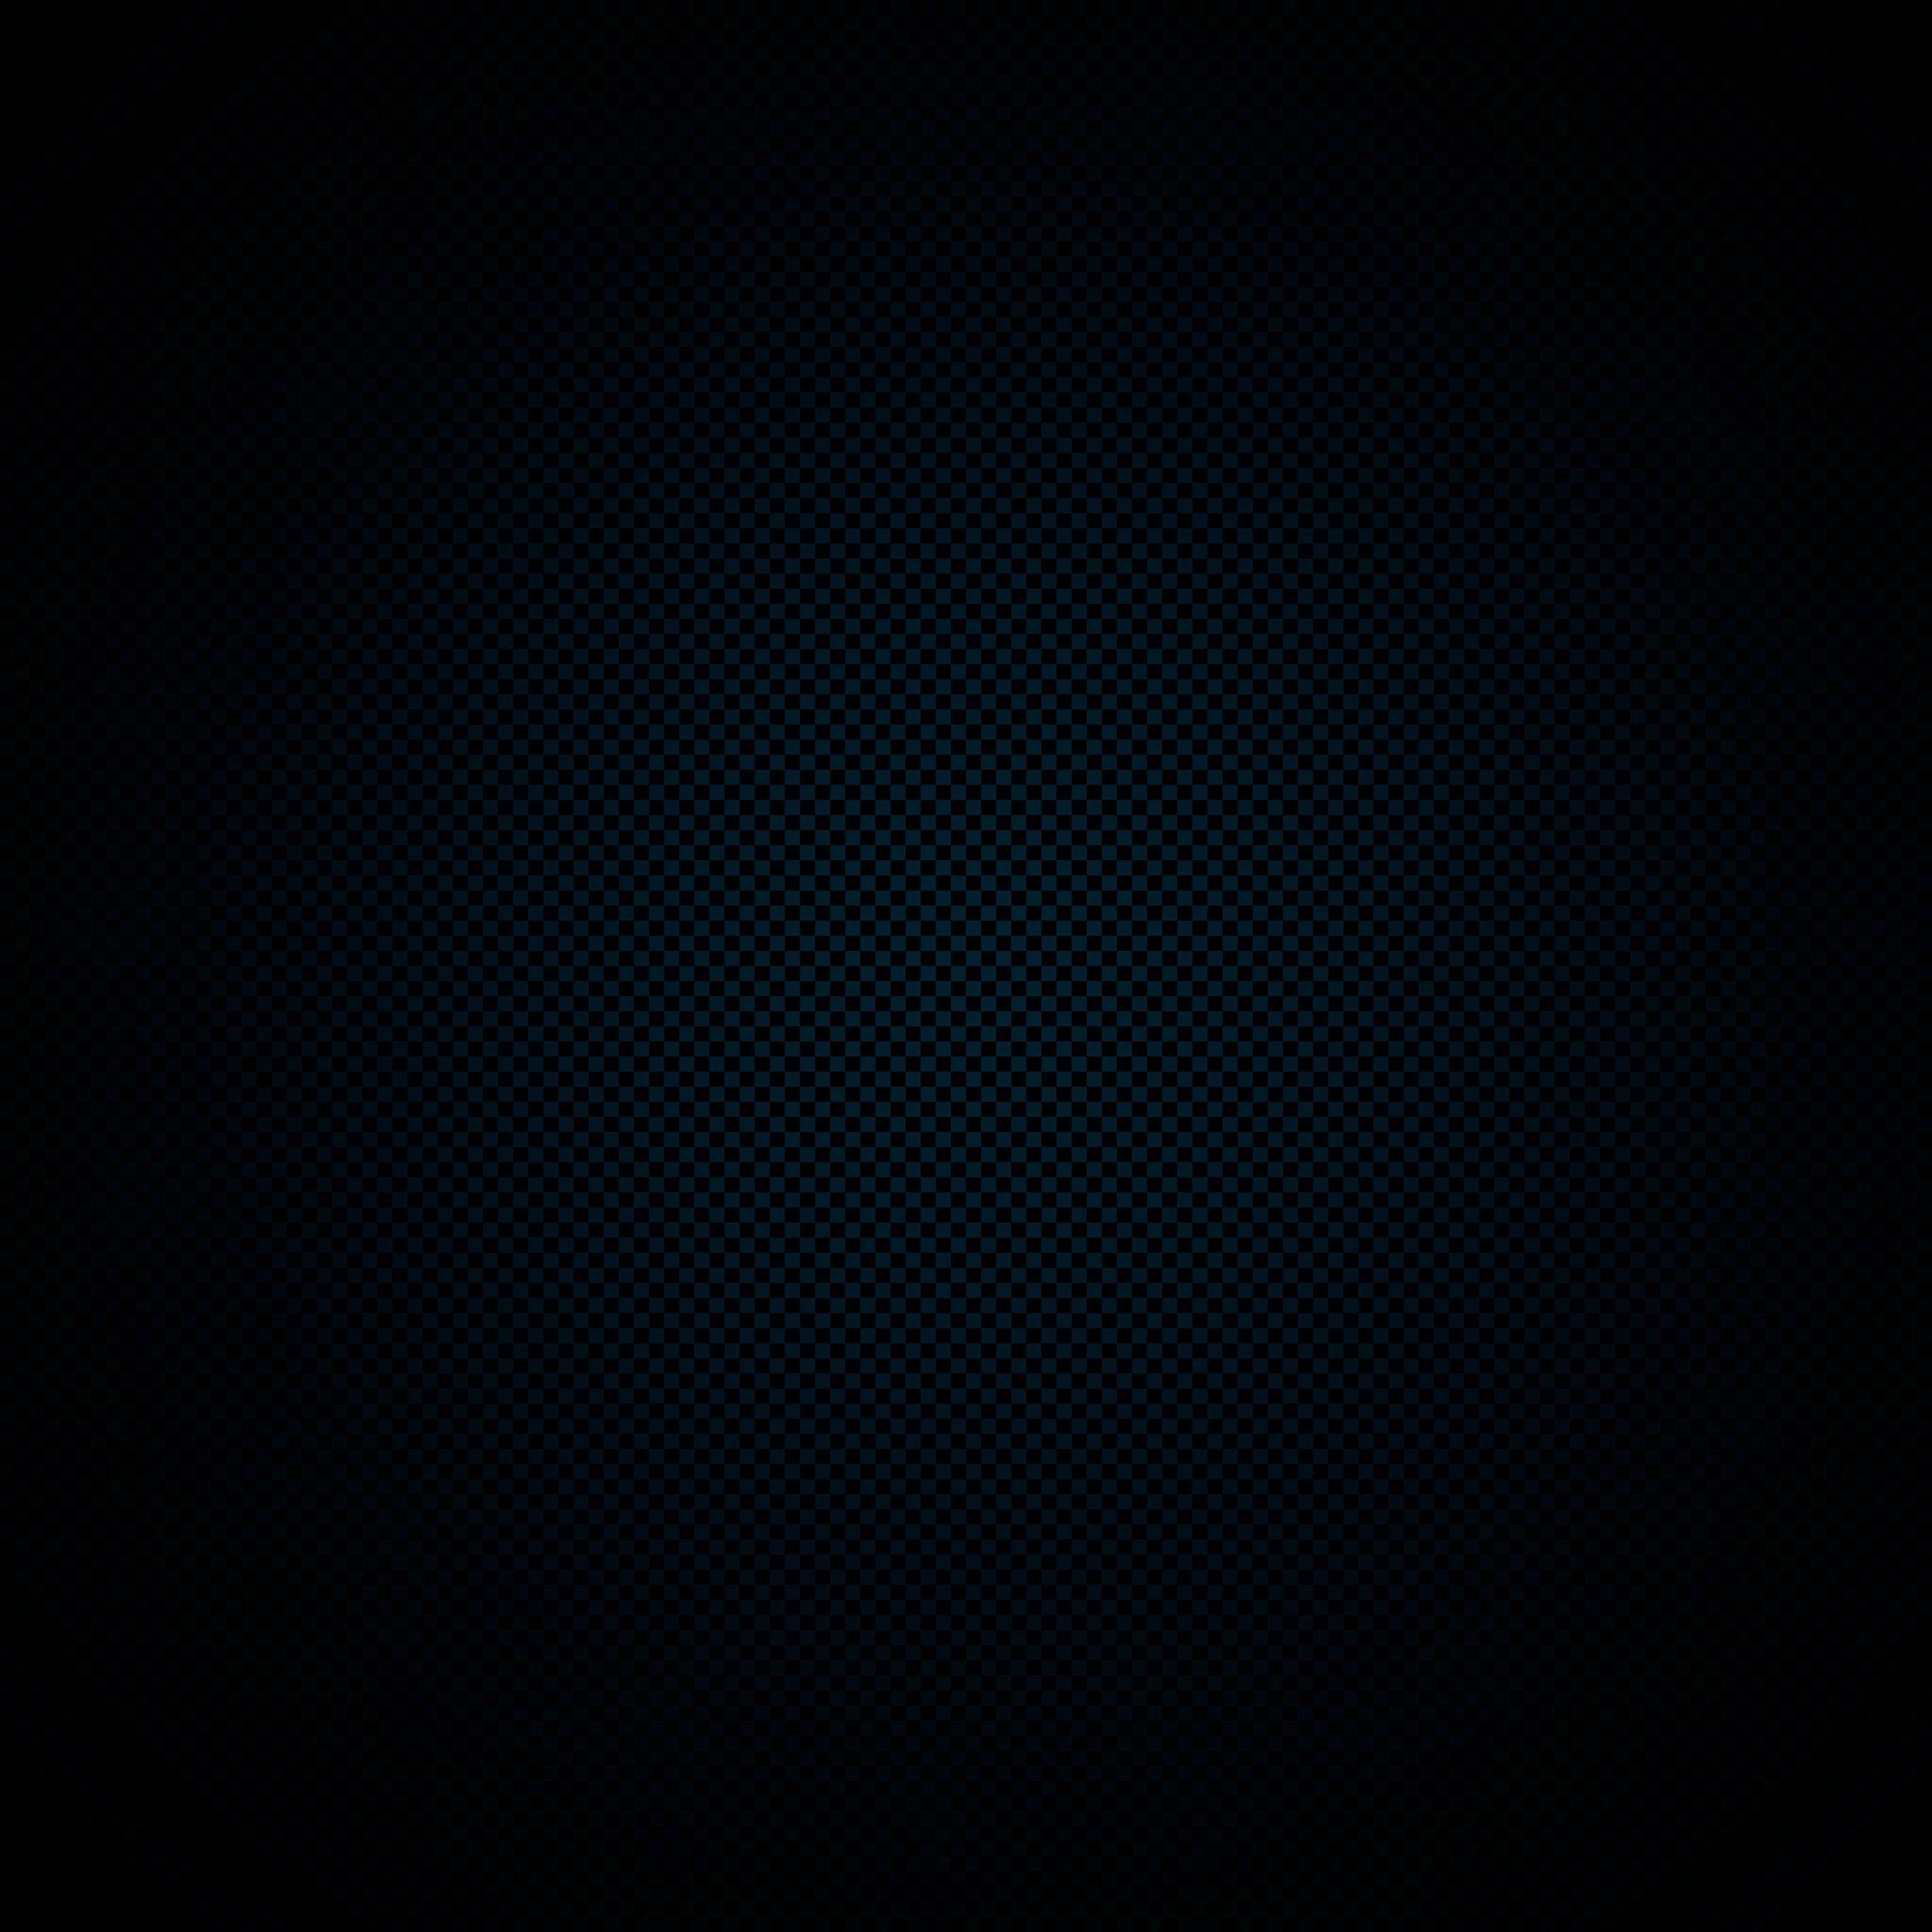 Pattern Logo Black